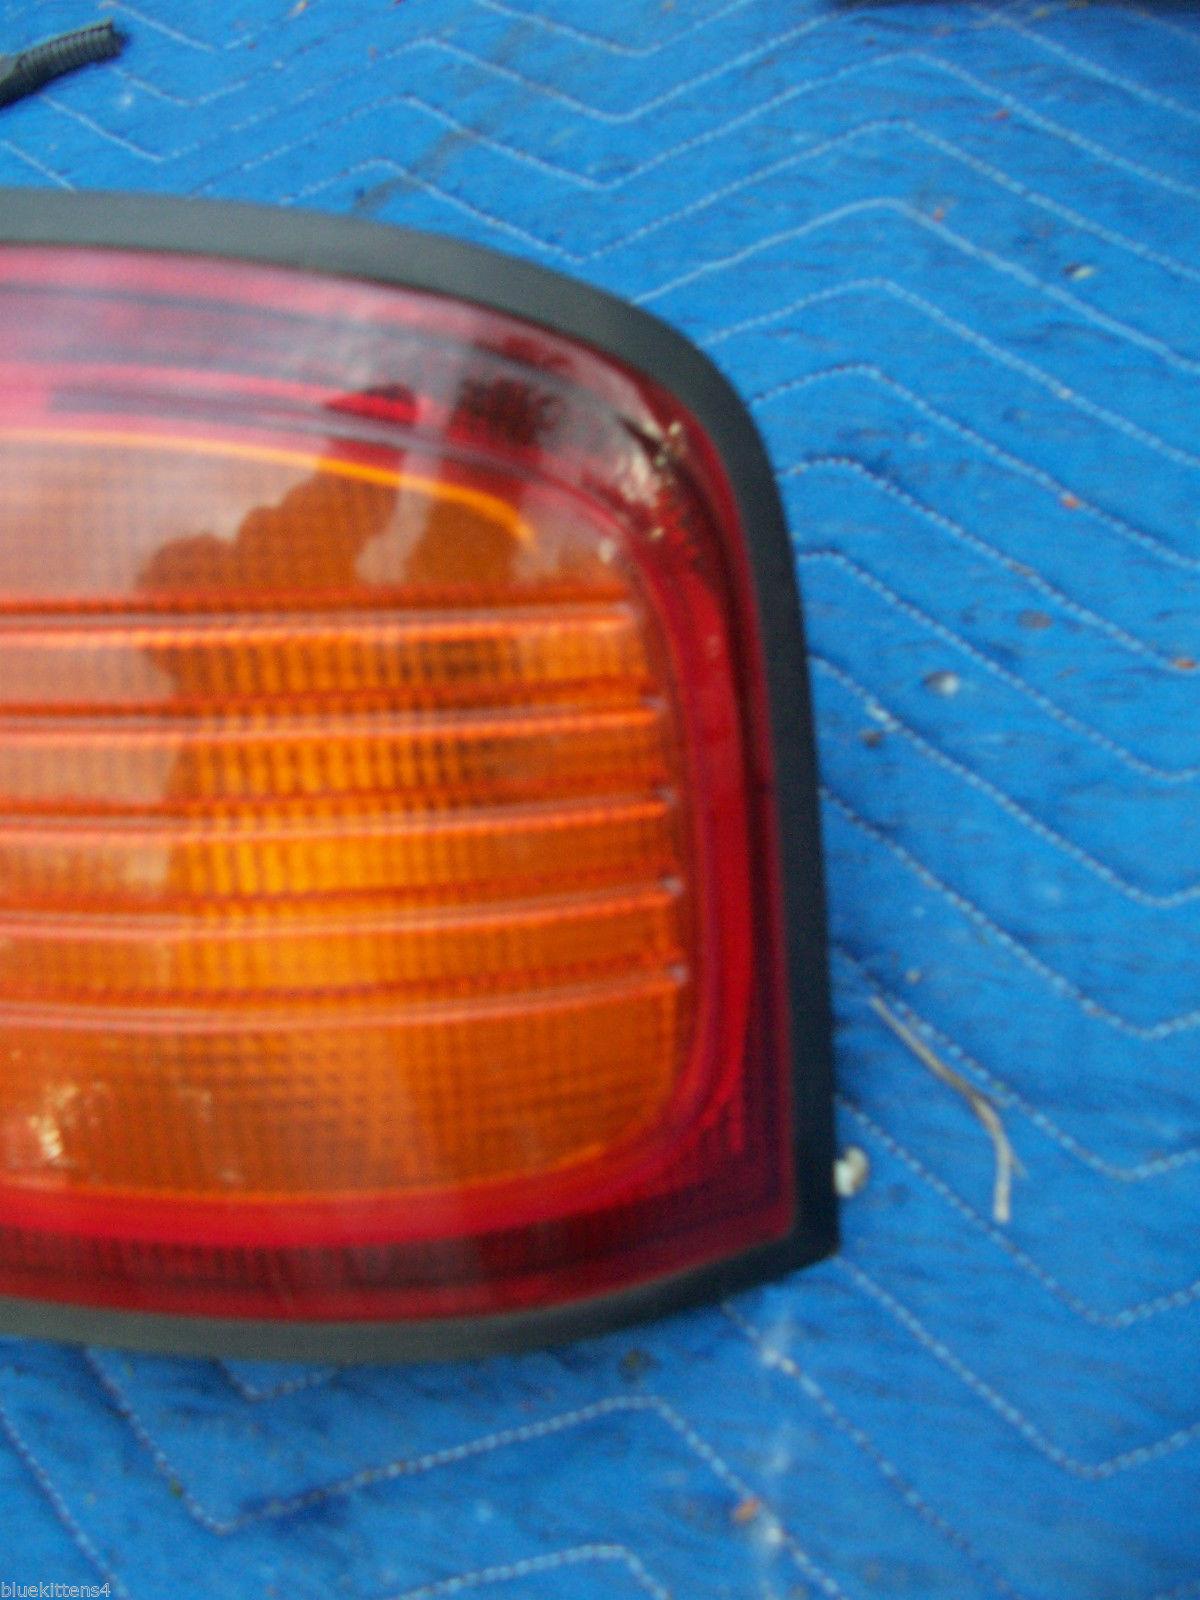 1992 1993 1994 PROTEGE RIGHT TAILLIGHT BRAKE TURN LIGHT OEM USED ORIGINAL MAZDA image 5